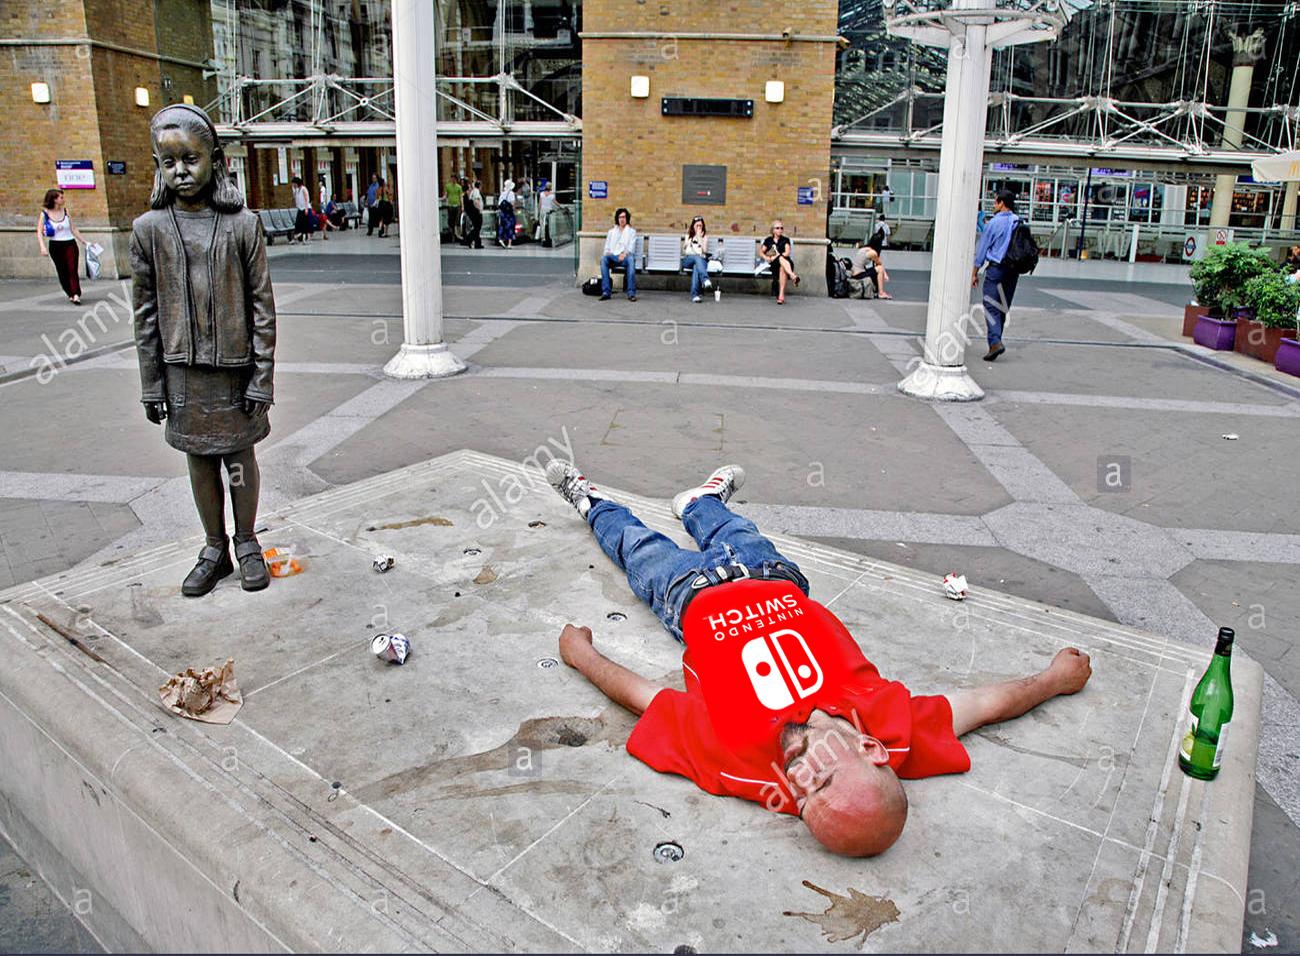 an-englsih-football-fan-asleep-and-drunk-outside-liverpool-street-AMPTAJ.jpg